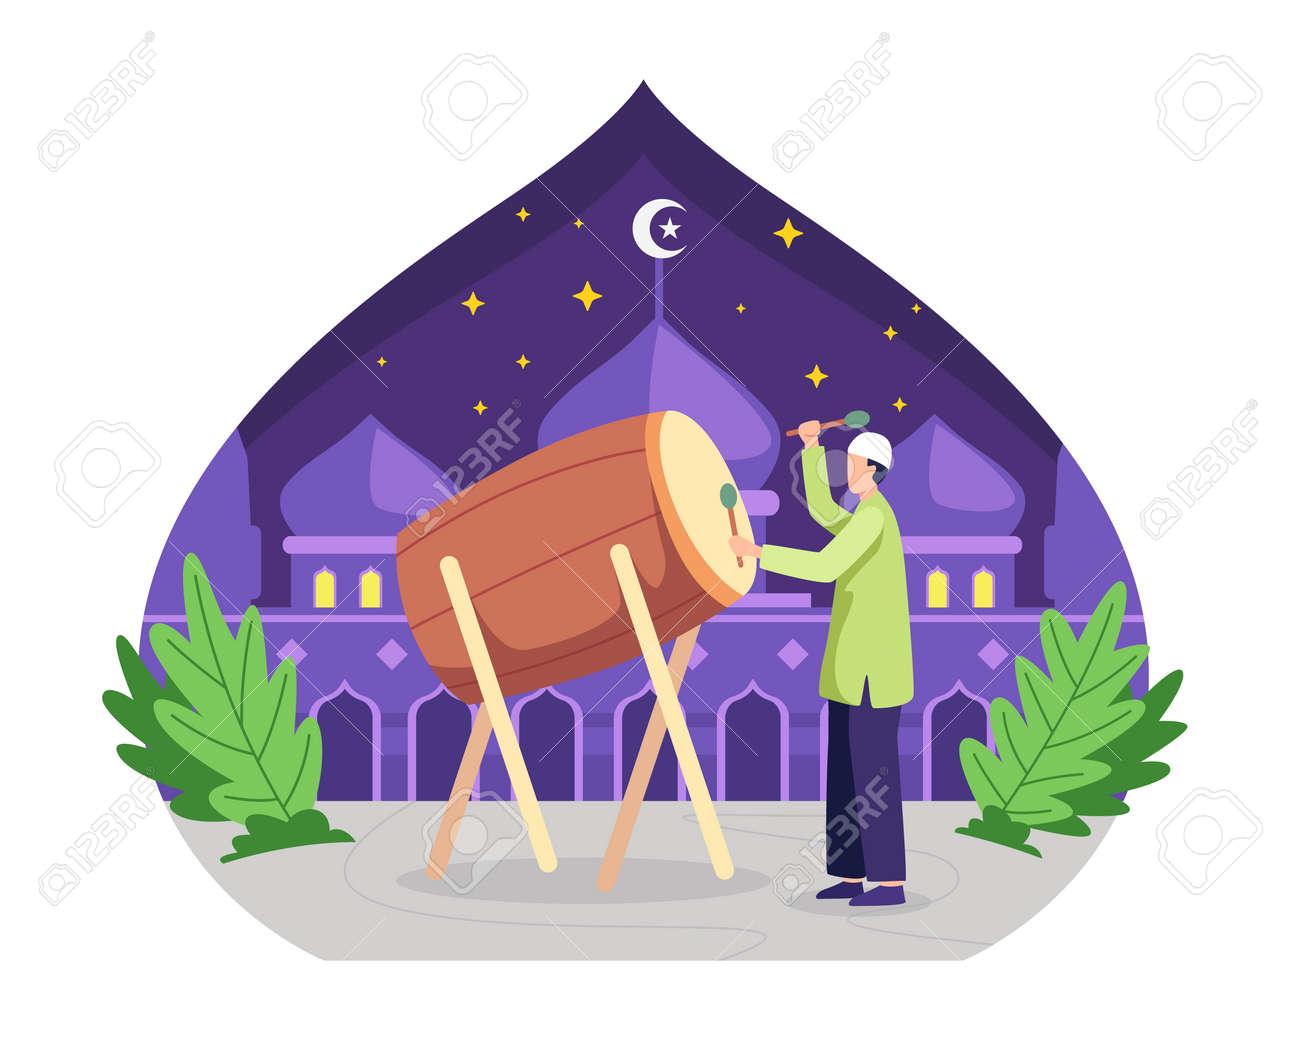 Happy muslim hitting drum and celebrating Eid Mubarak. Ramadan kareem celebration, Happy fasting and iftar party. Vector illustration in a flat style - 168304455